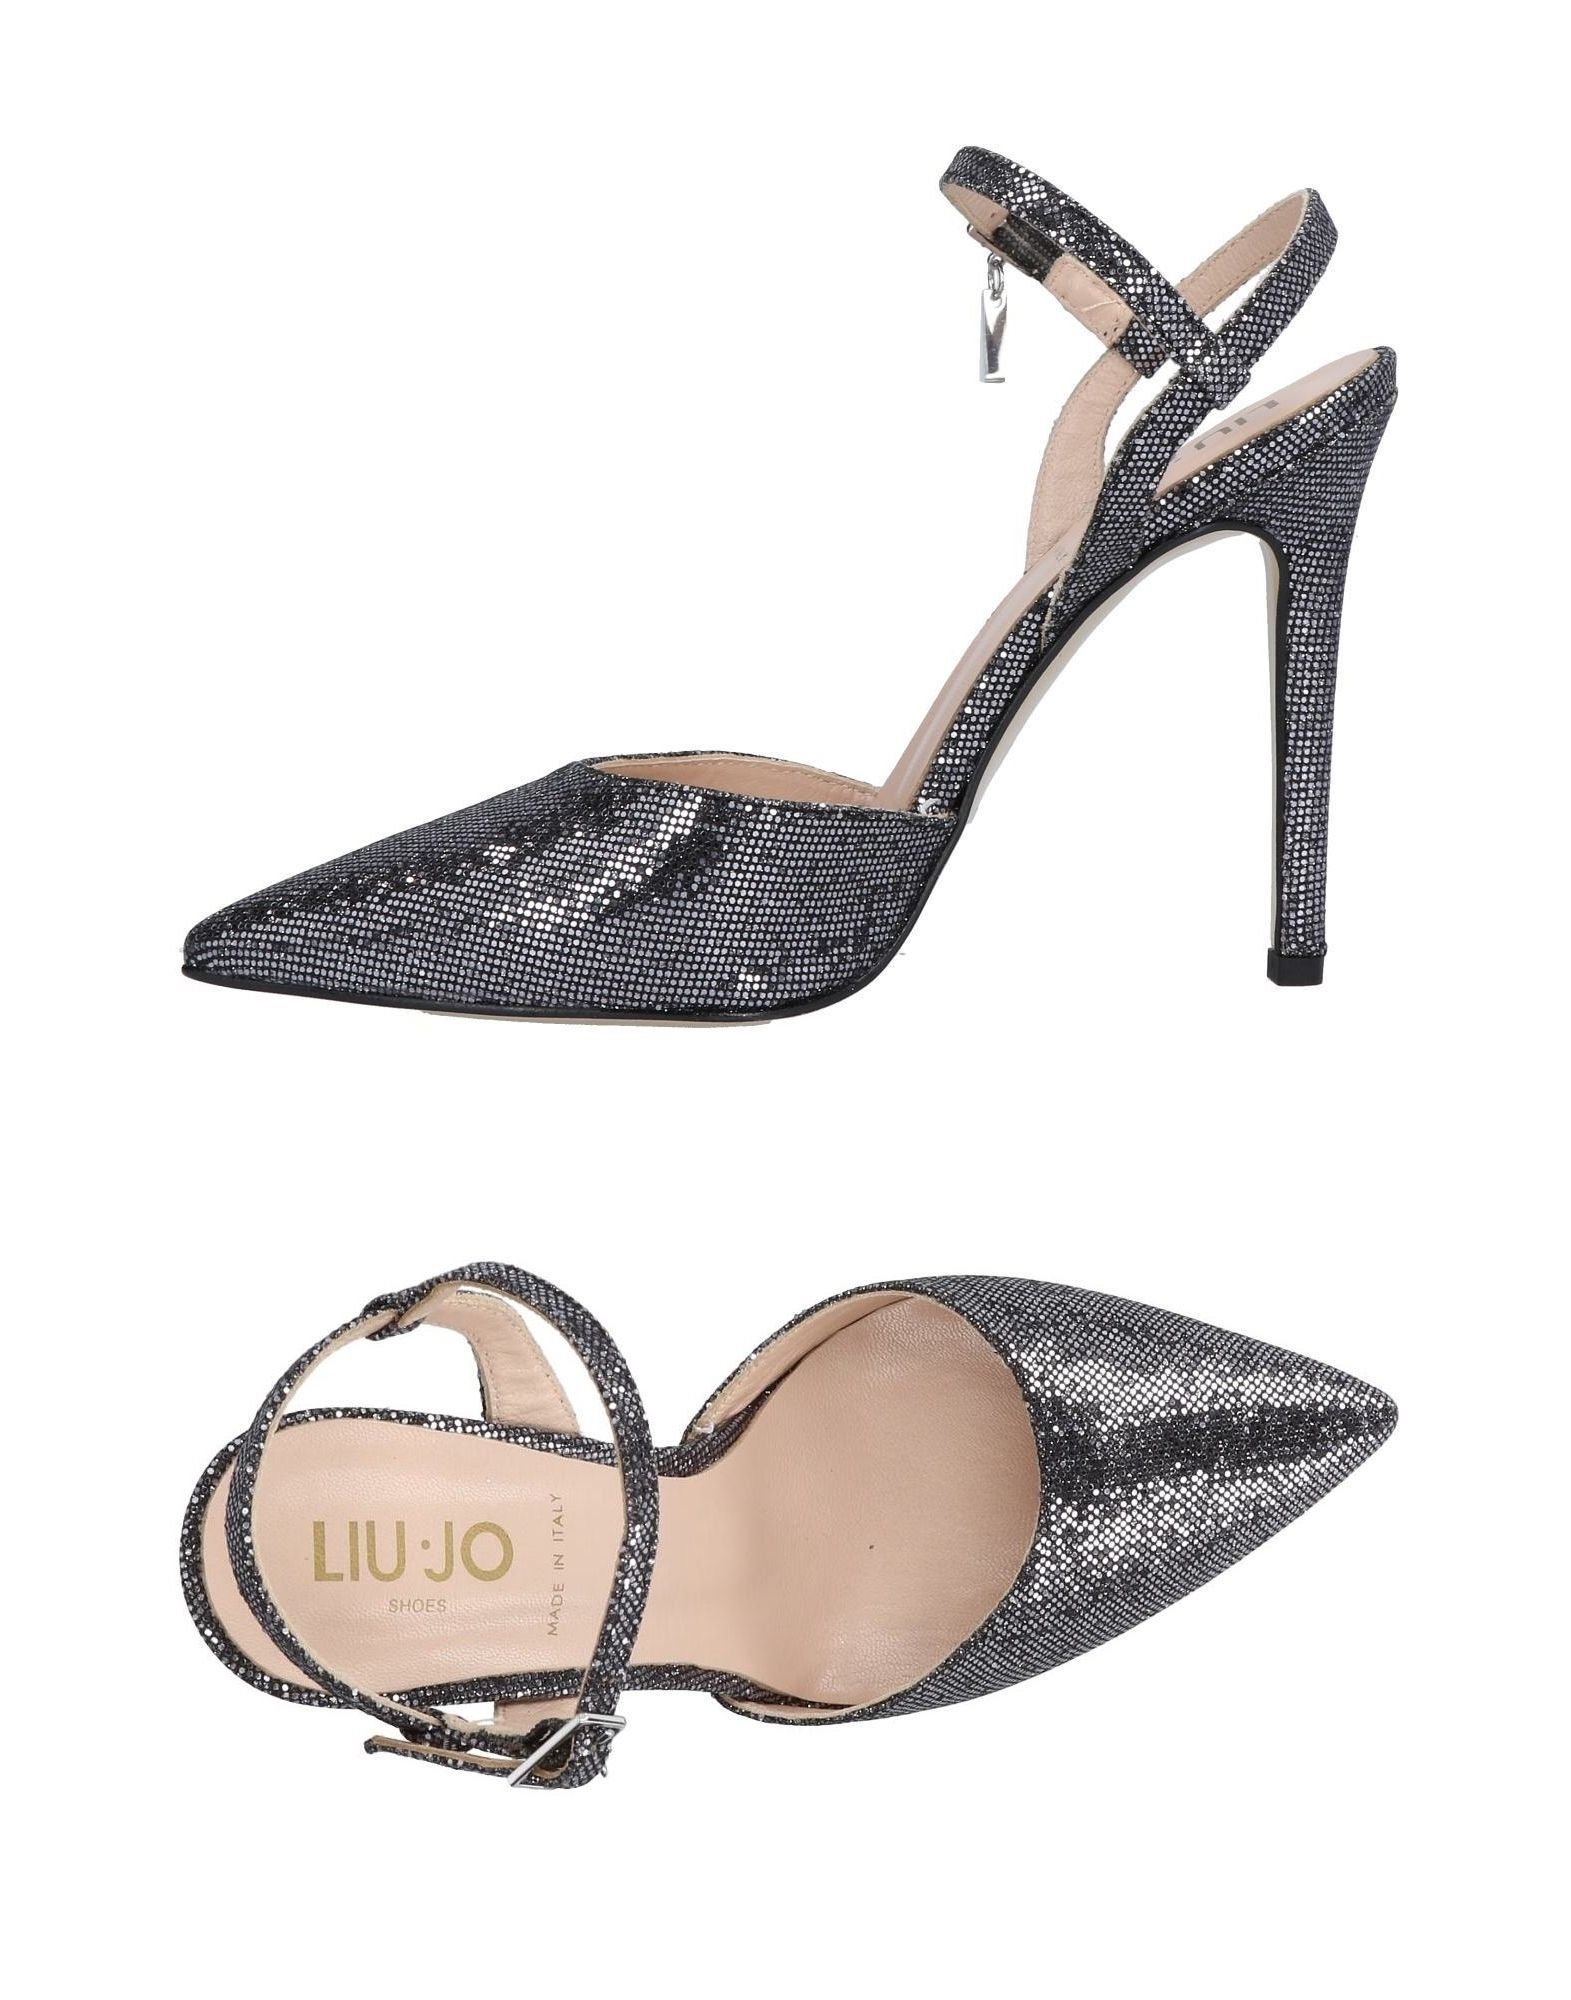 LIU •JO SHOES Туфли shoes bosccolo туфли с ремешком